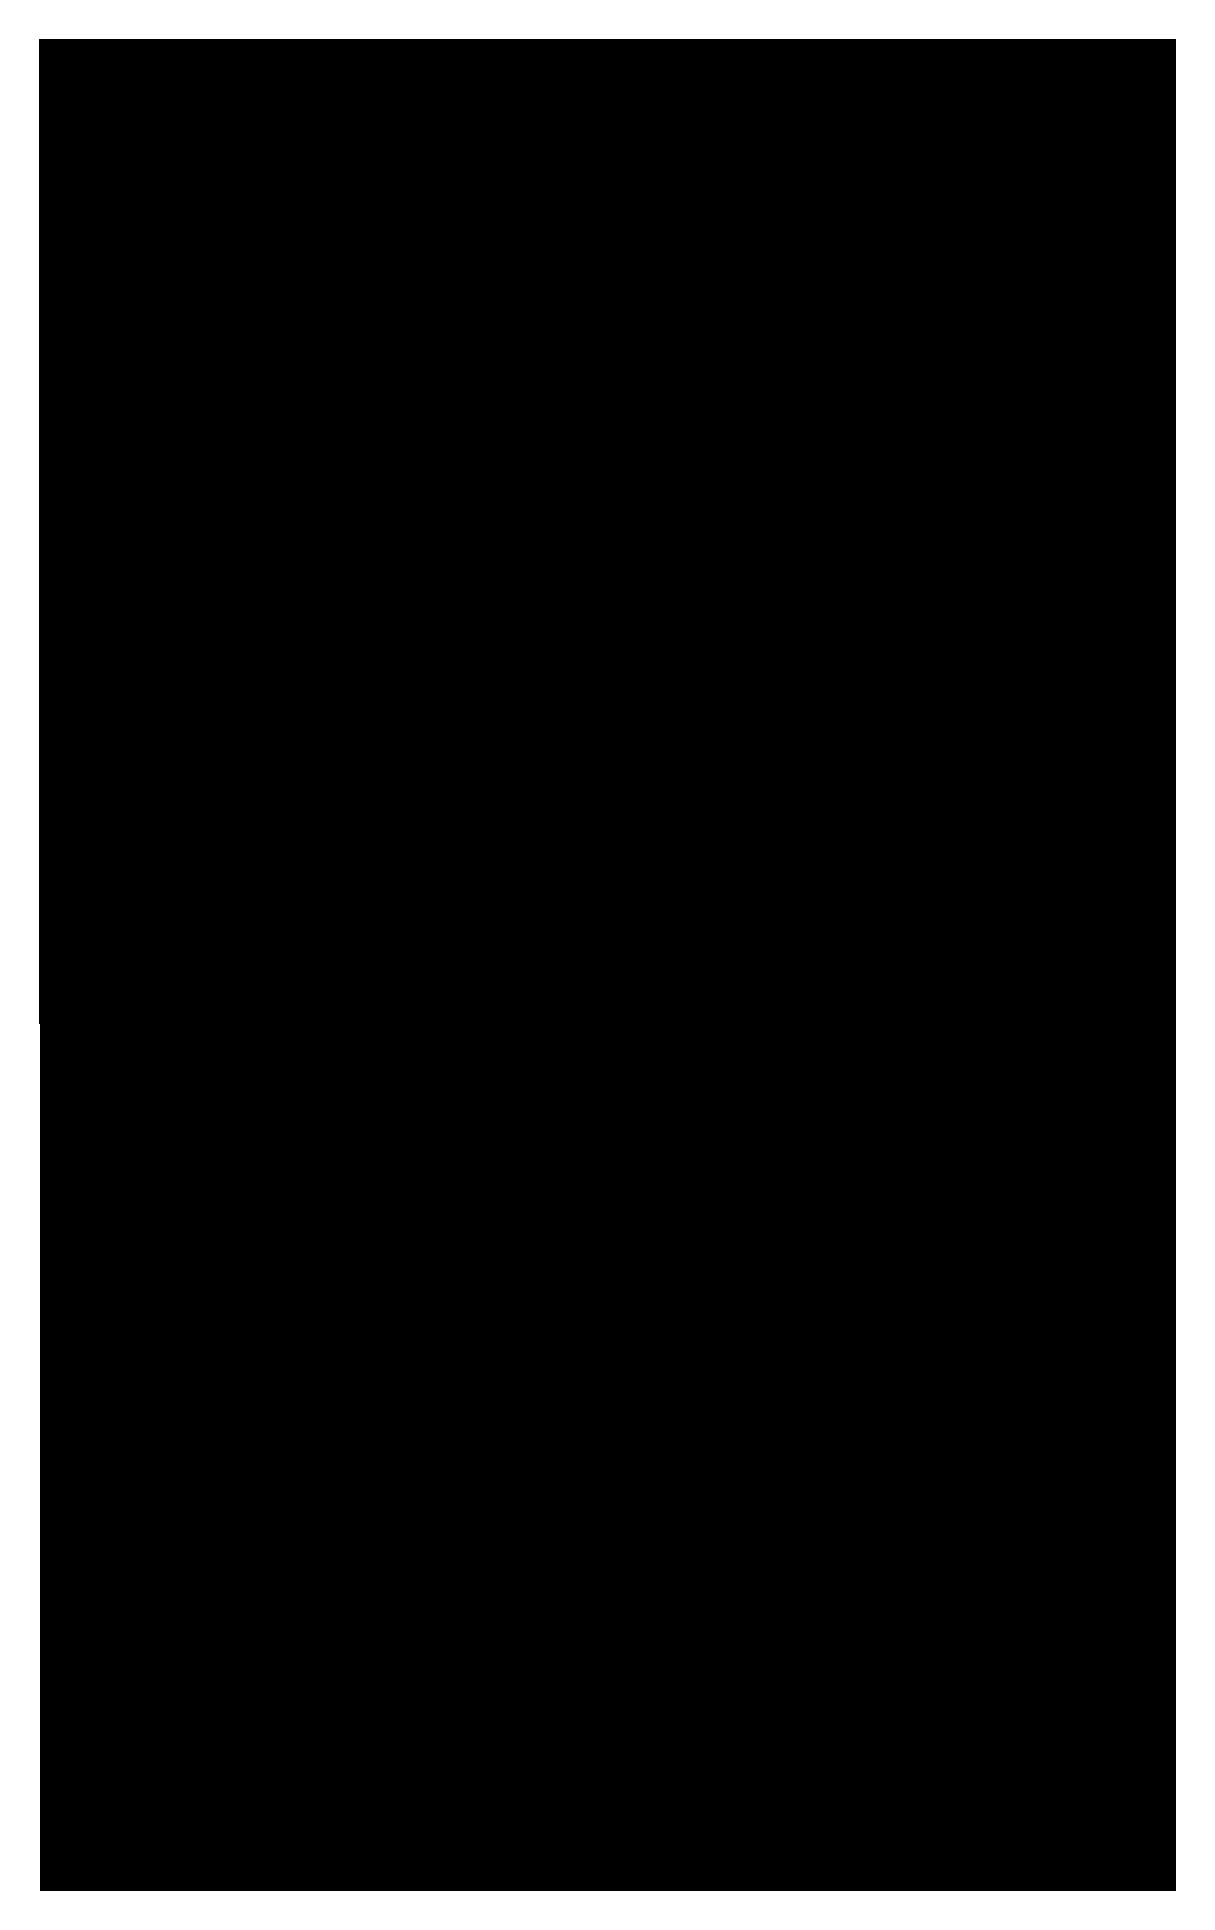 XEEN 專業電影鏡頭規格 (PL, Canon EF, Nikon F, Sony E, Micro 4/3 接口) - 14mm, 16mm, 20mm, 24mm, 35mm, 50mm, 85mm, 135mm